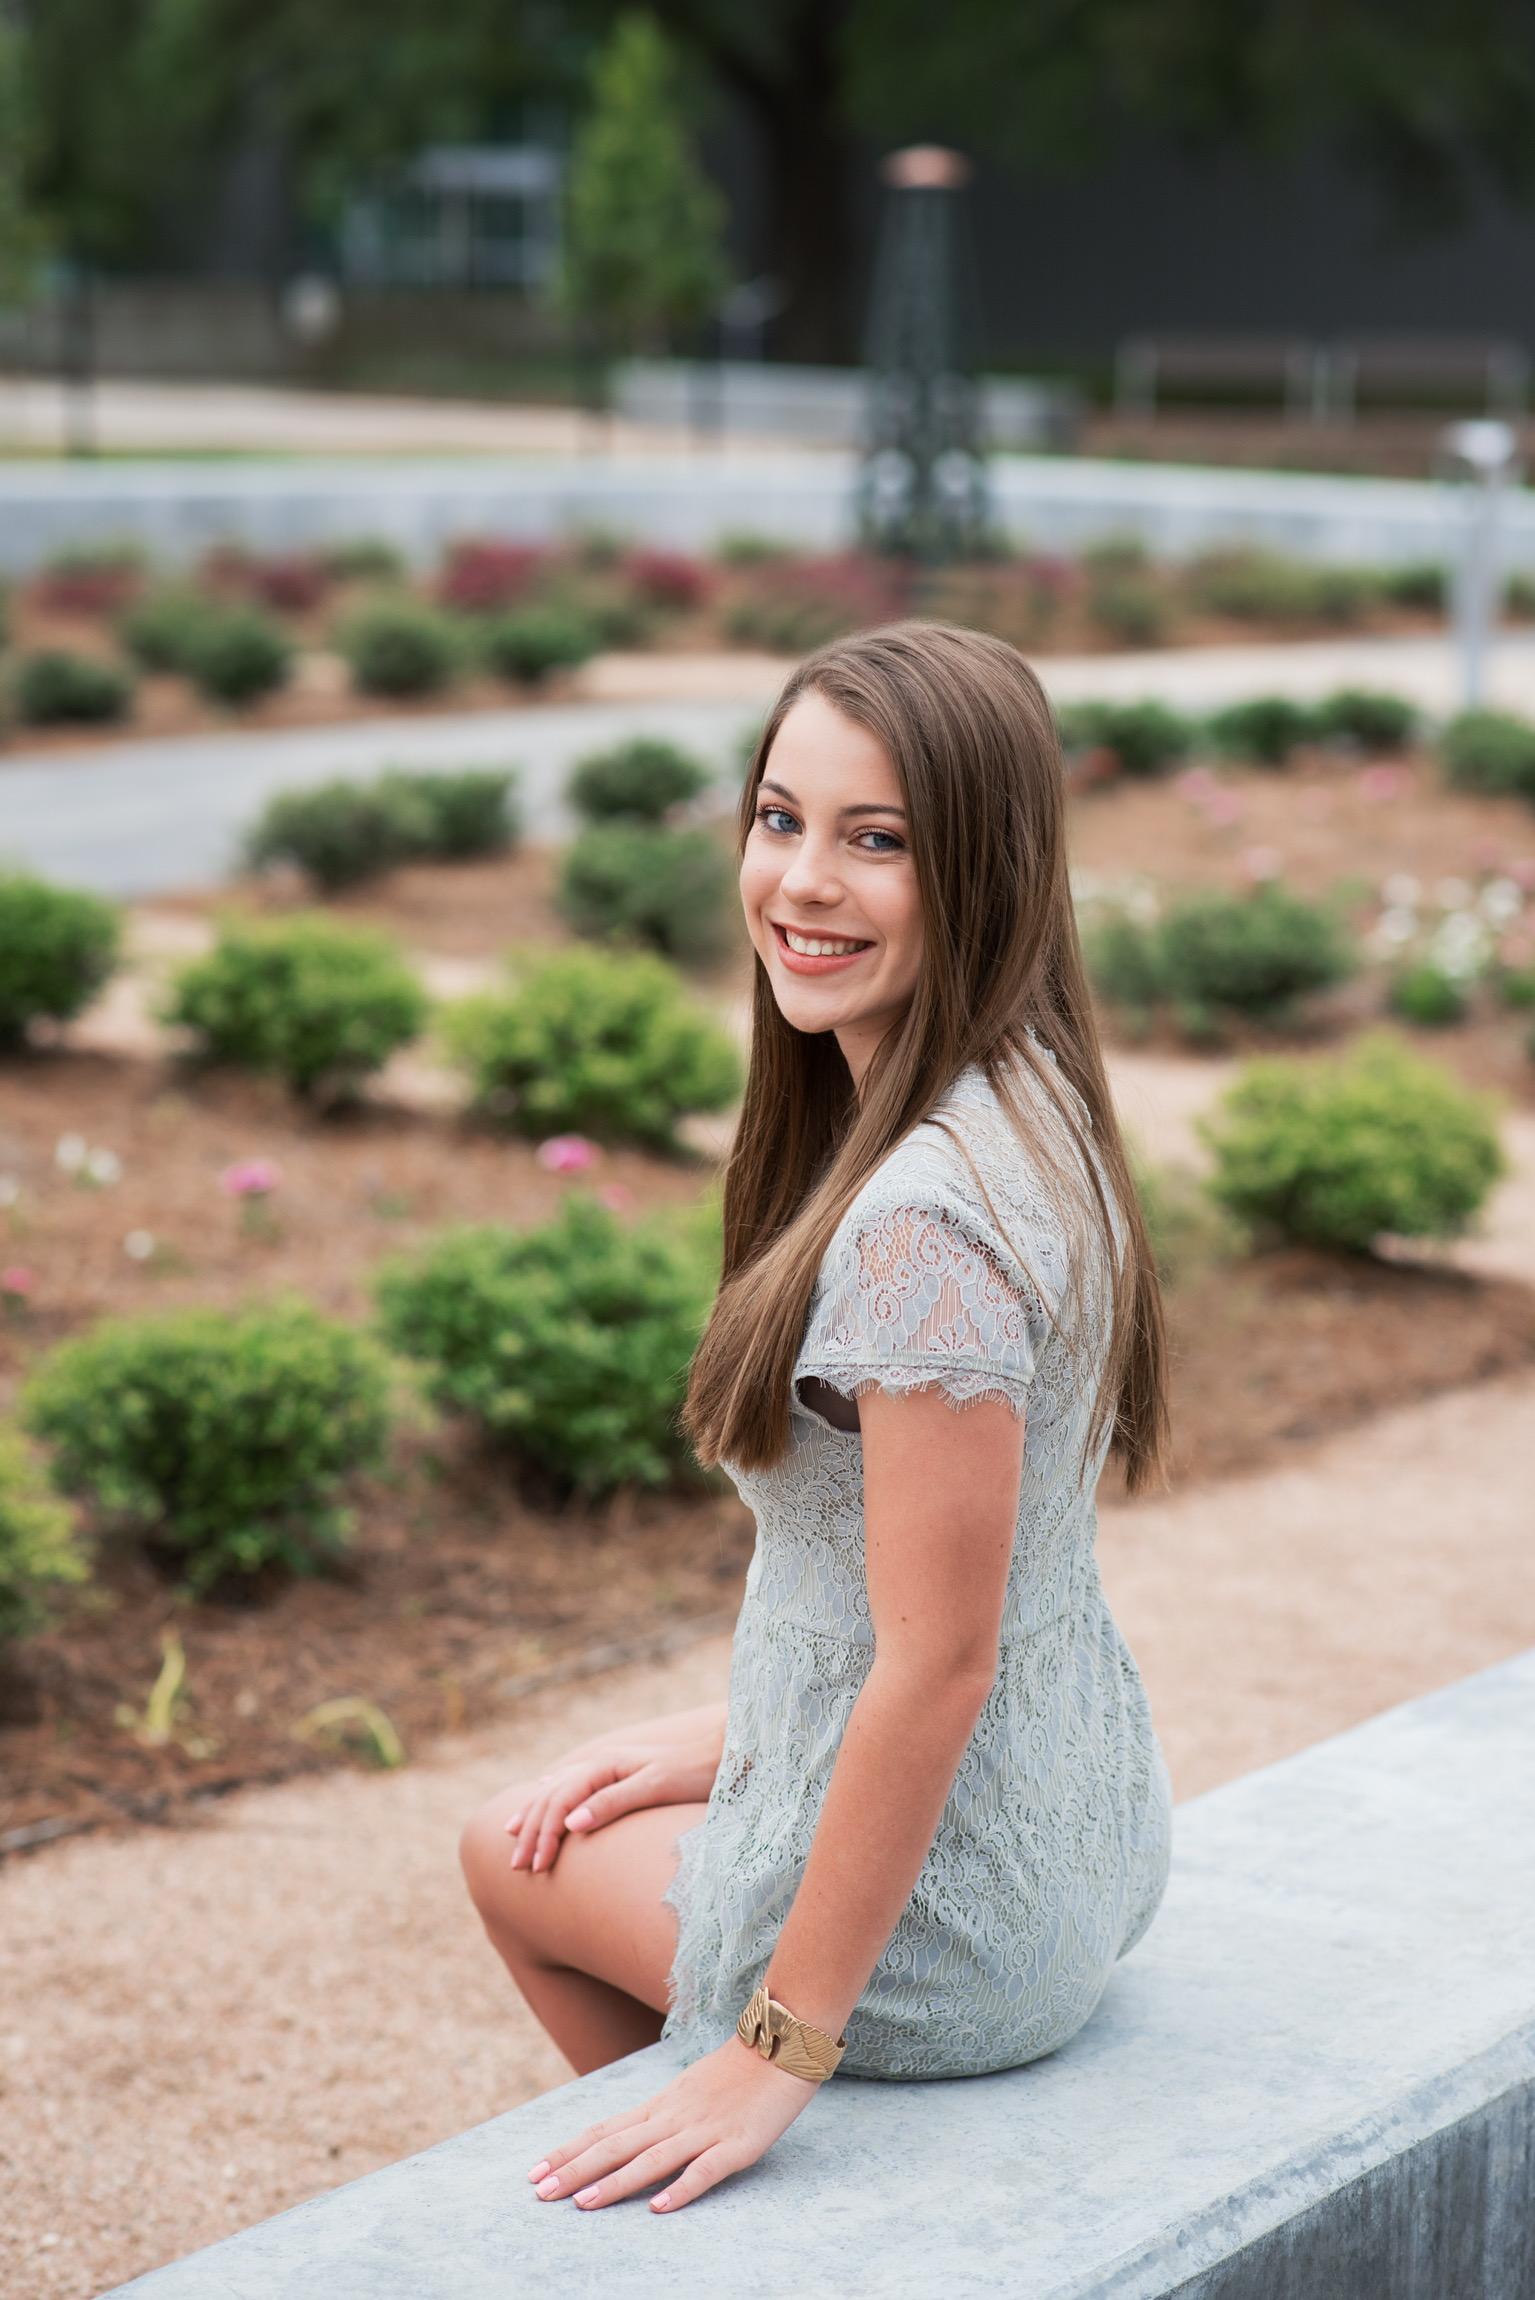 Lane Auxiliary Awards Scholarship to Area Student